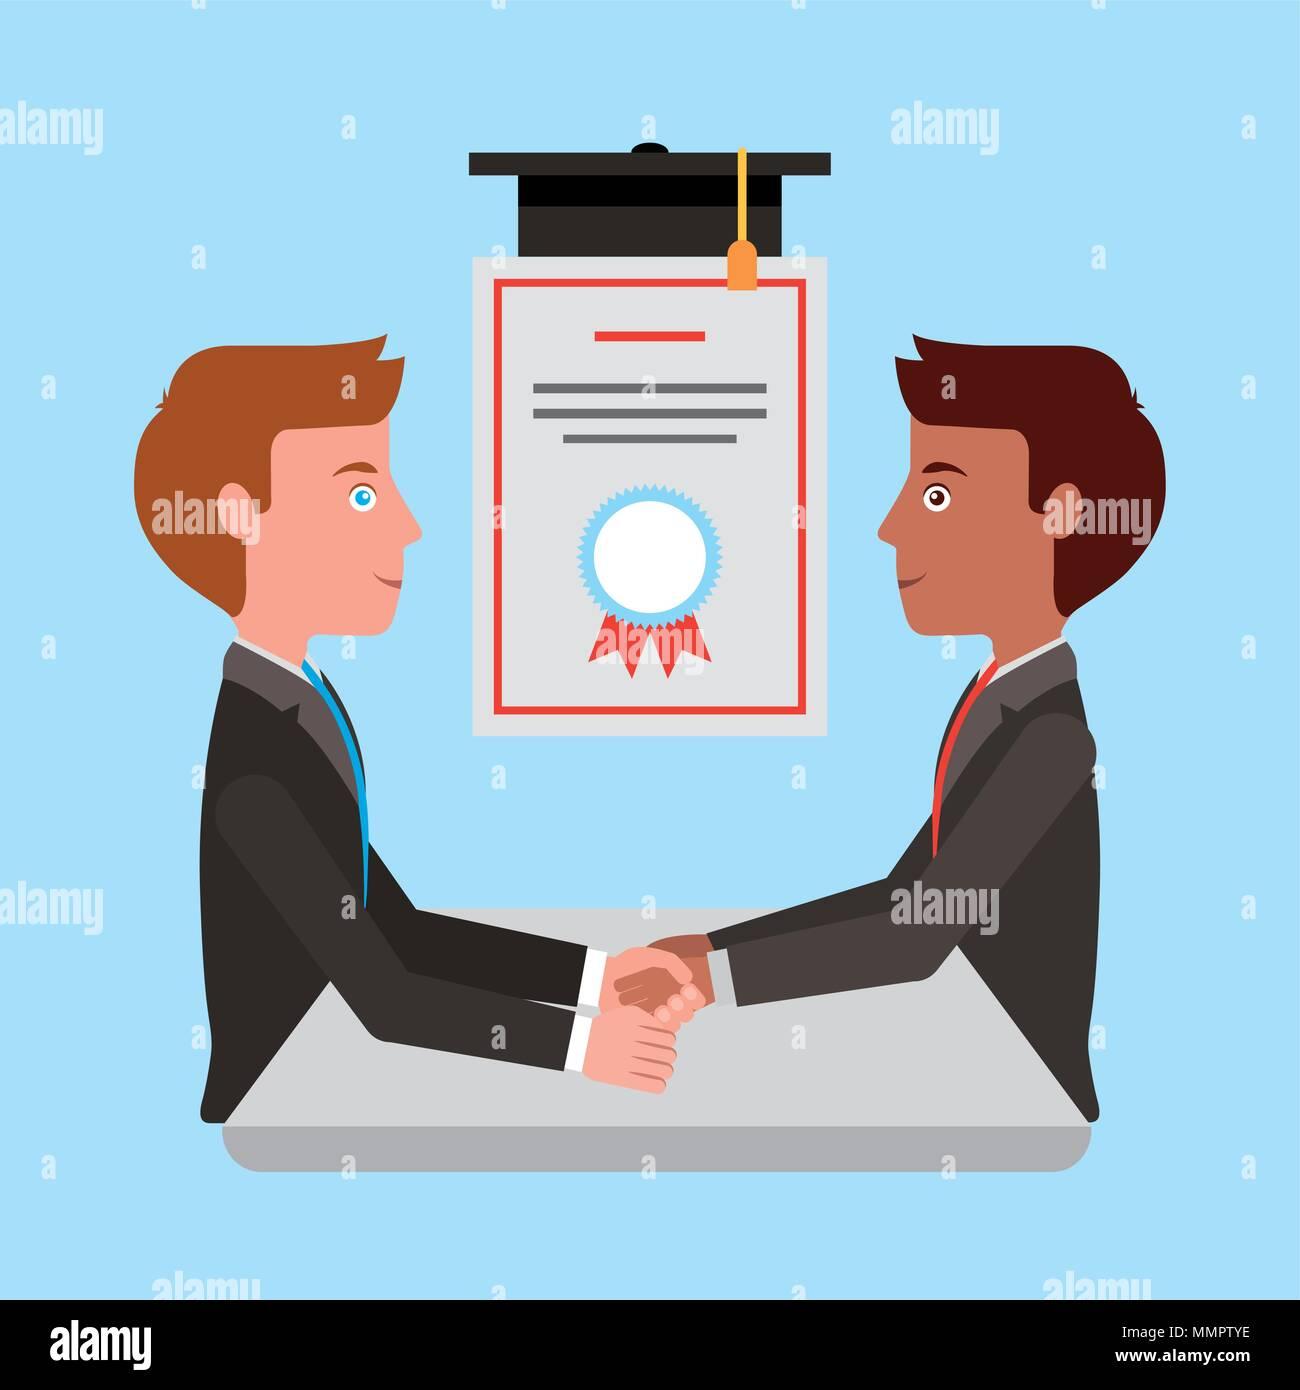 graduate students man handshake success cerfiticate vector illustration - Stock Image